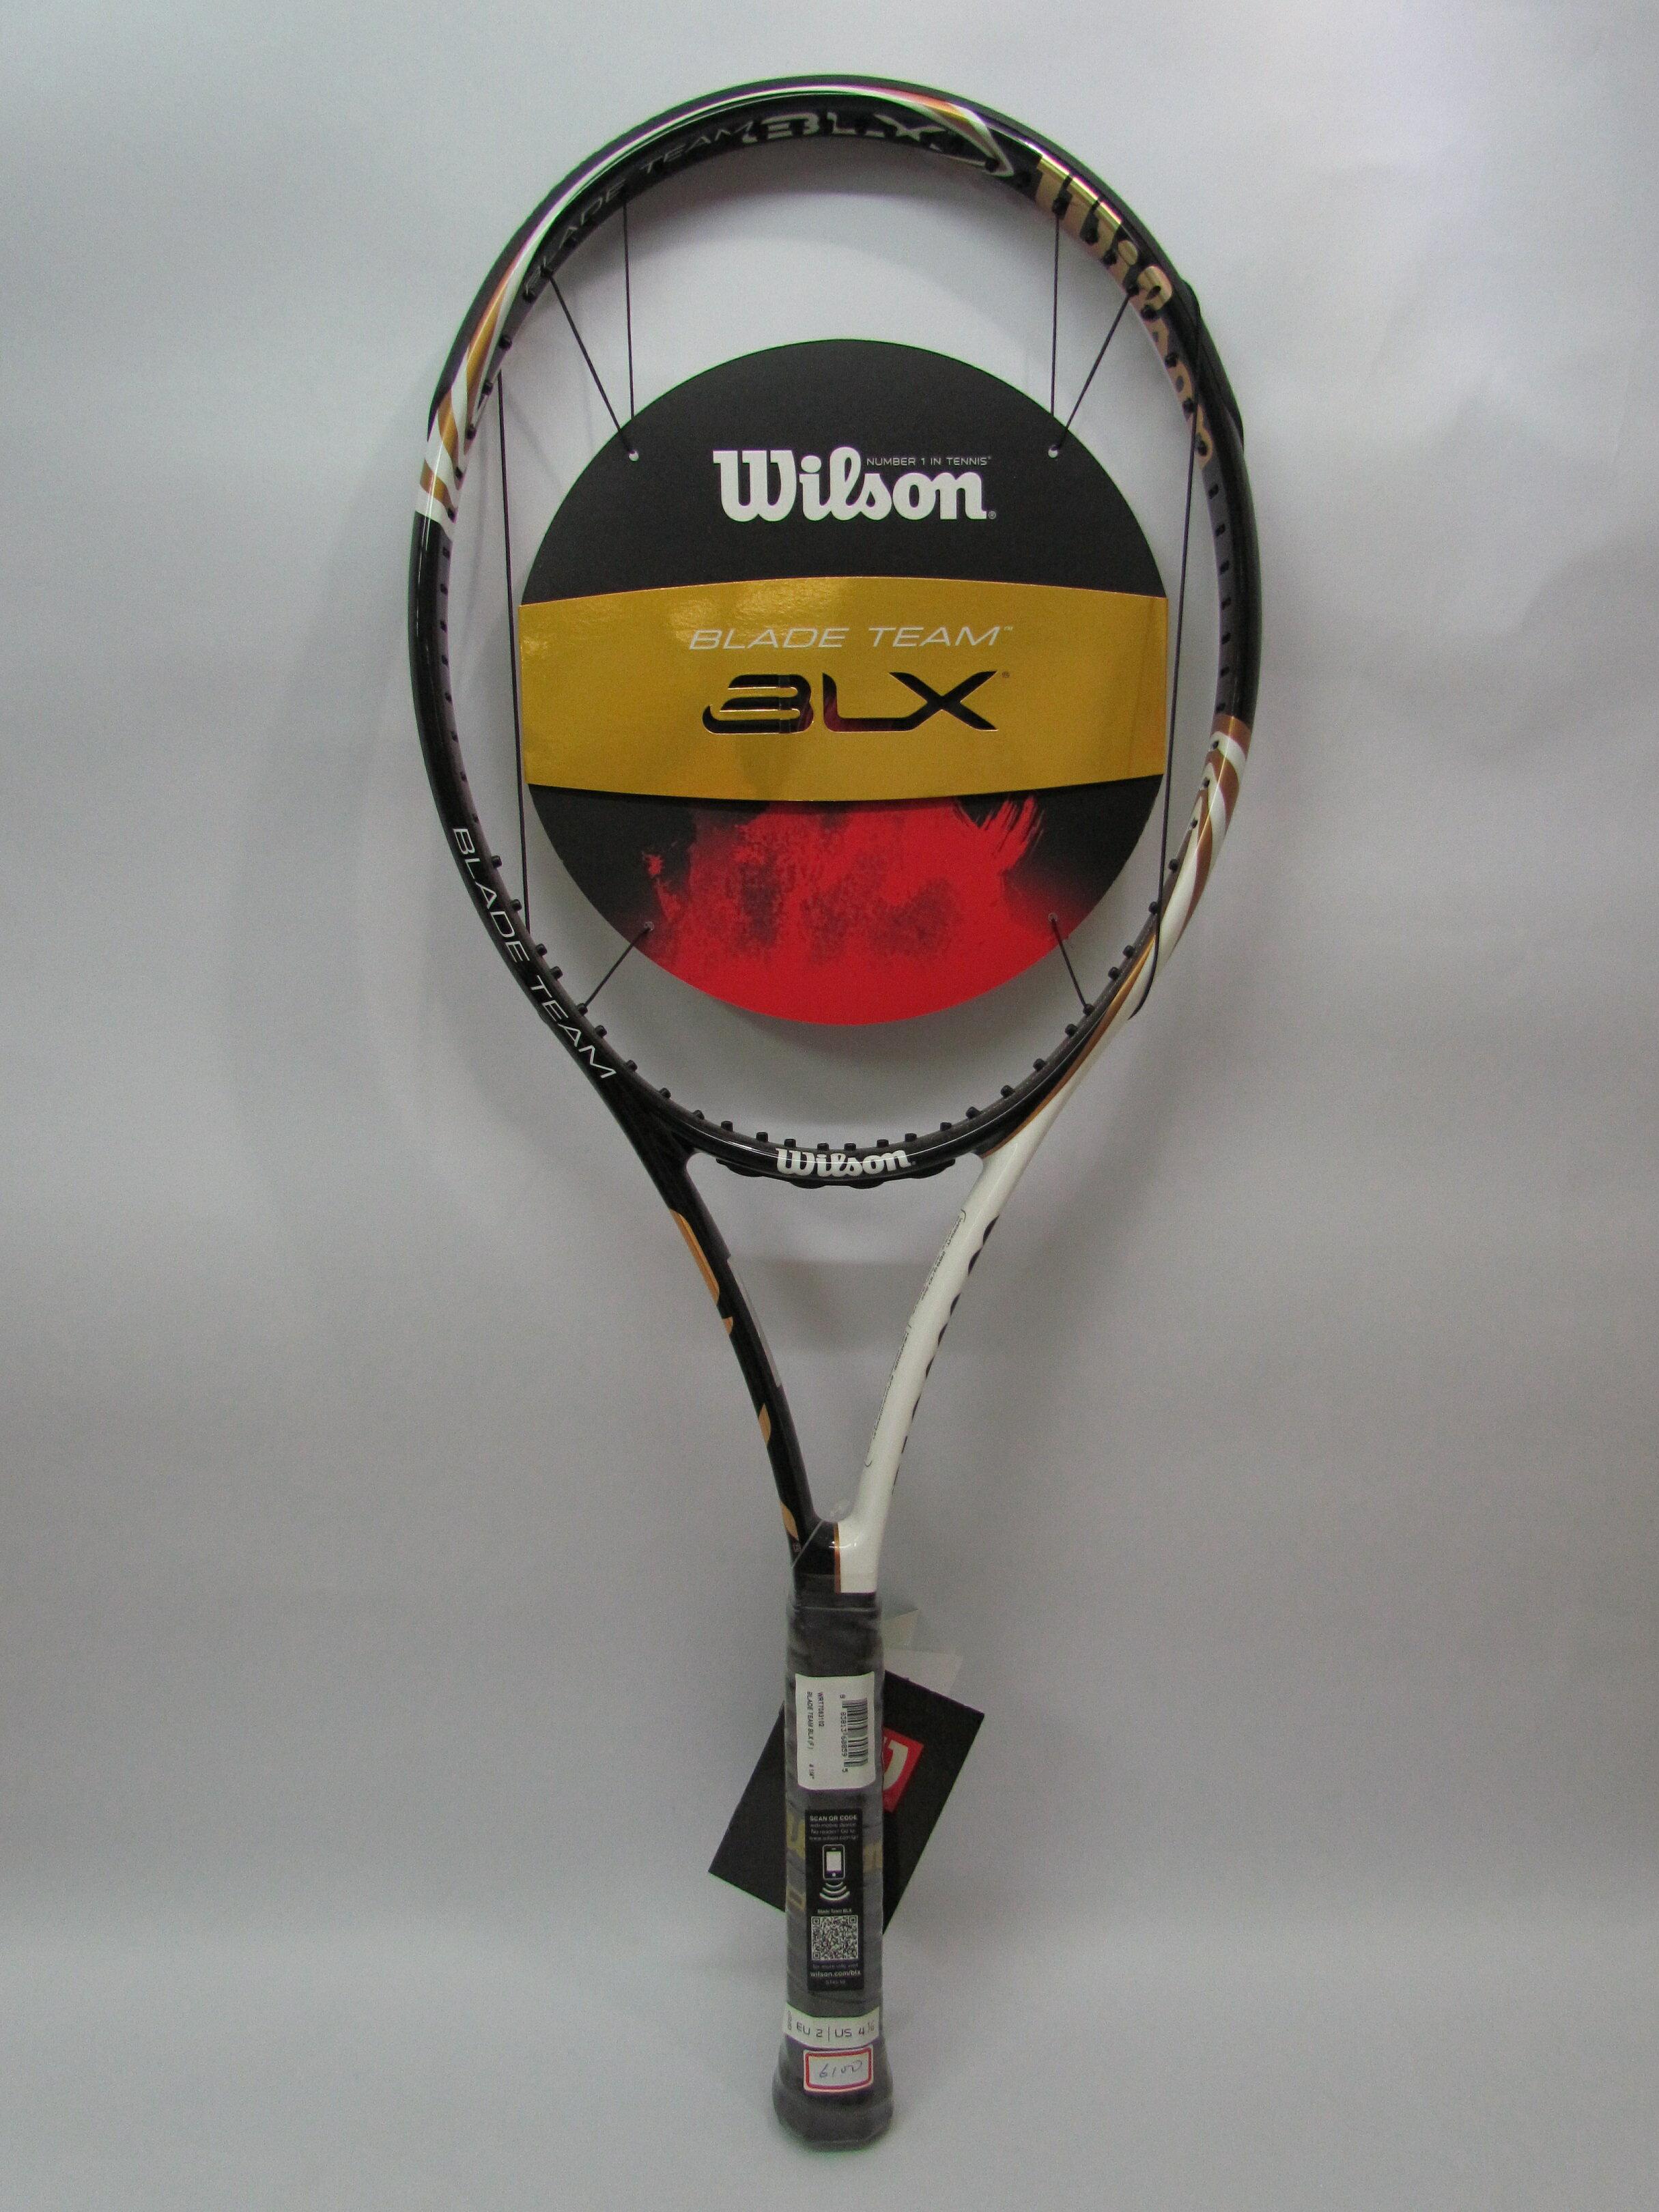 Wilson專業網球拍 Blade Team BLX